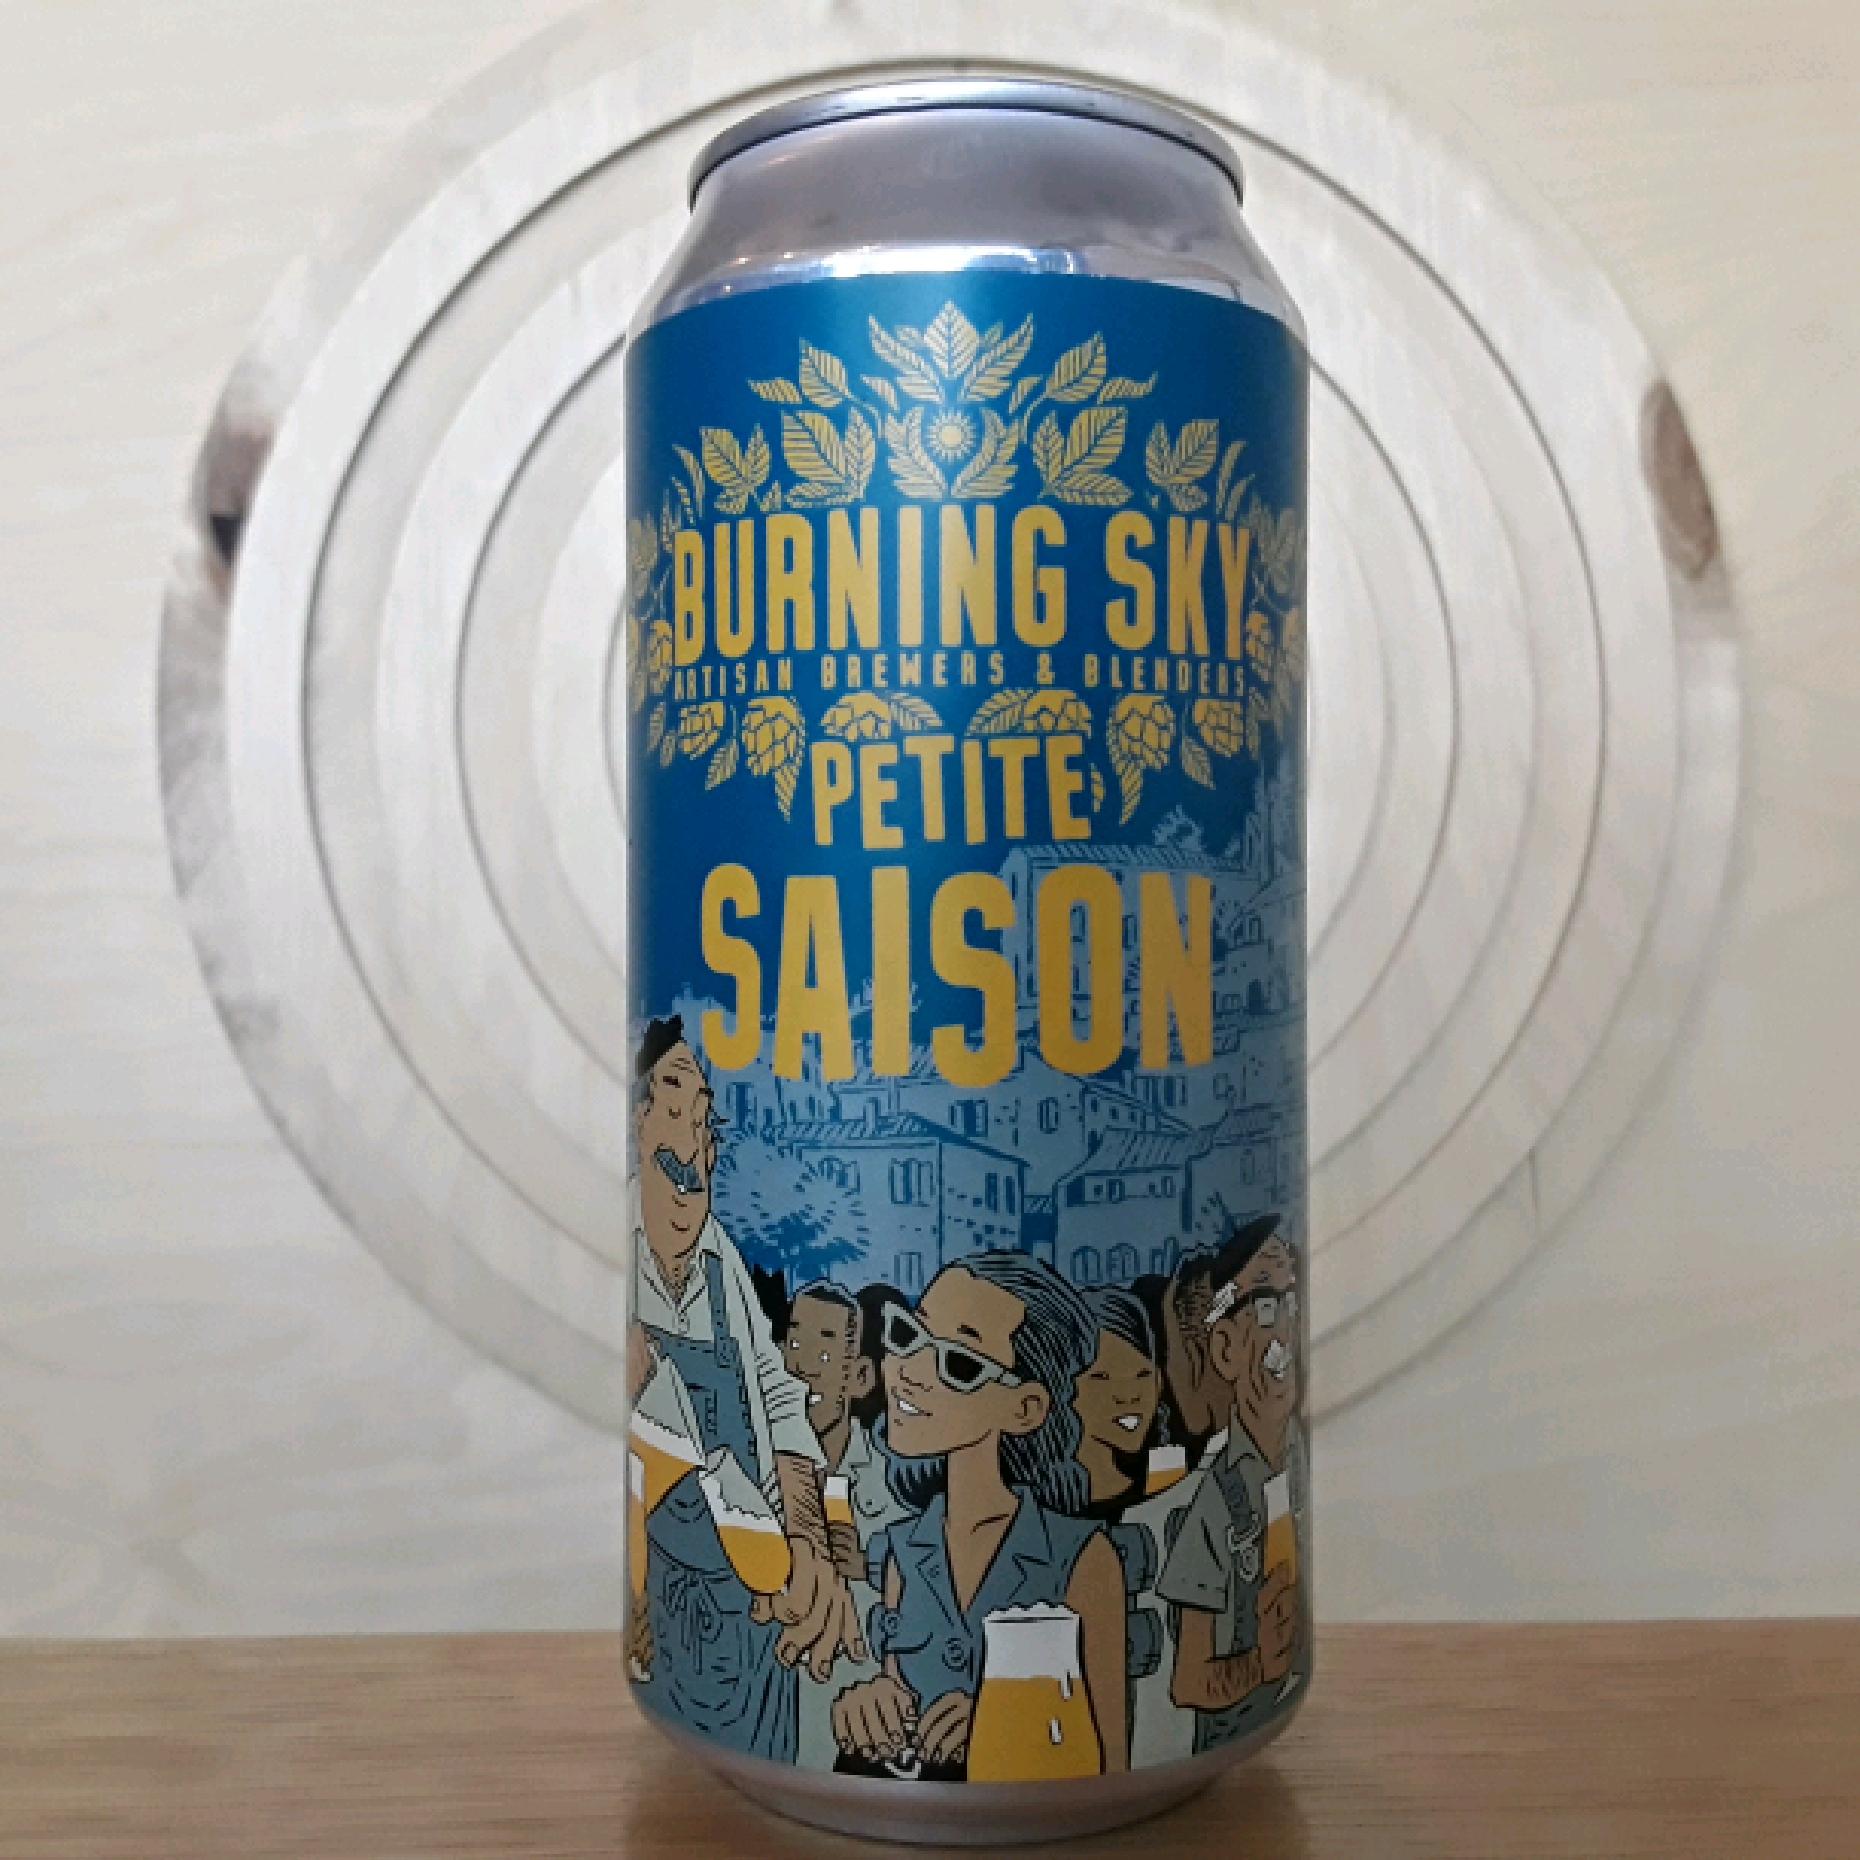 Burning Sky | Petite Saison | Saison